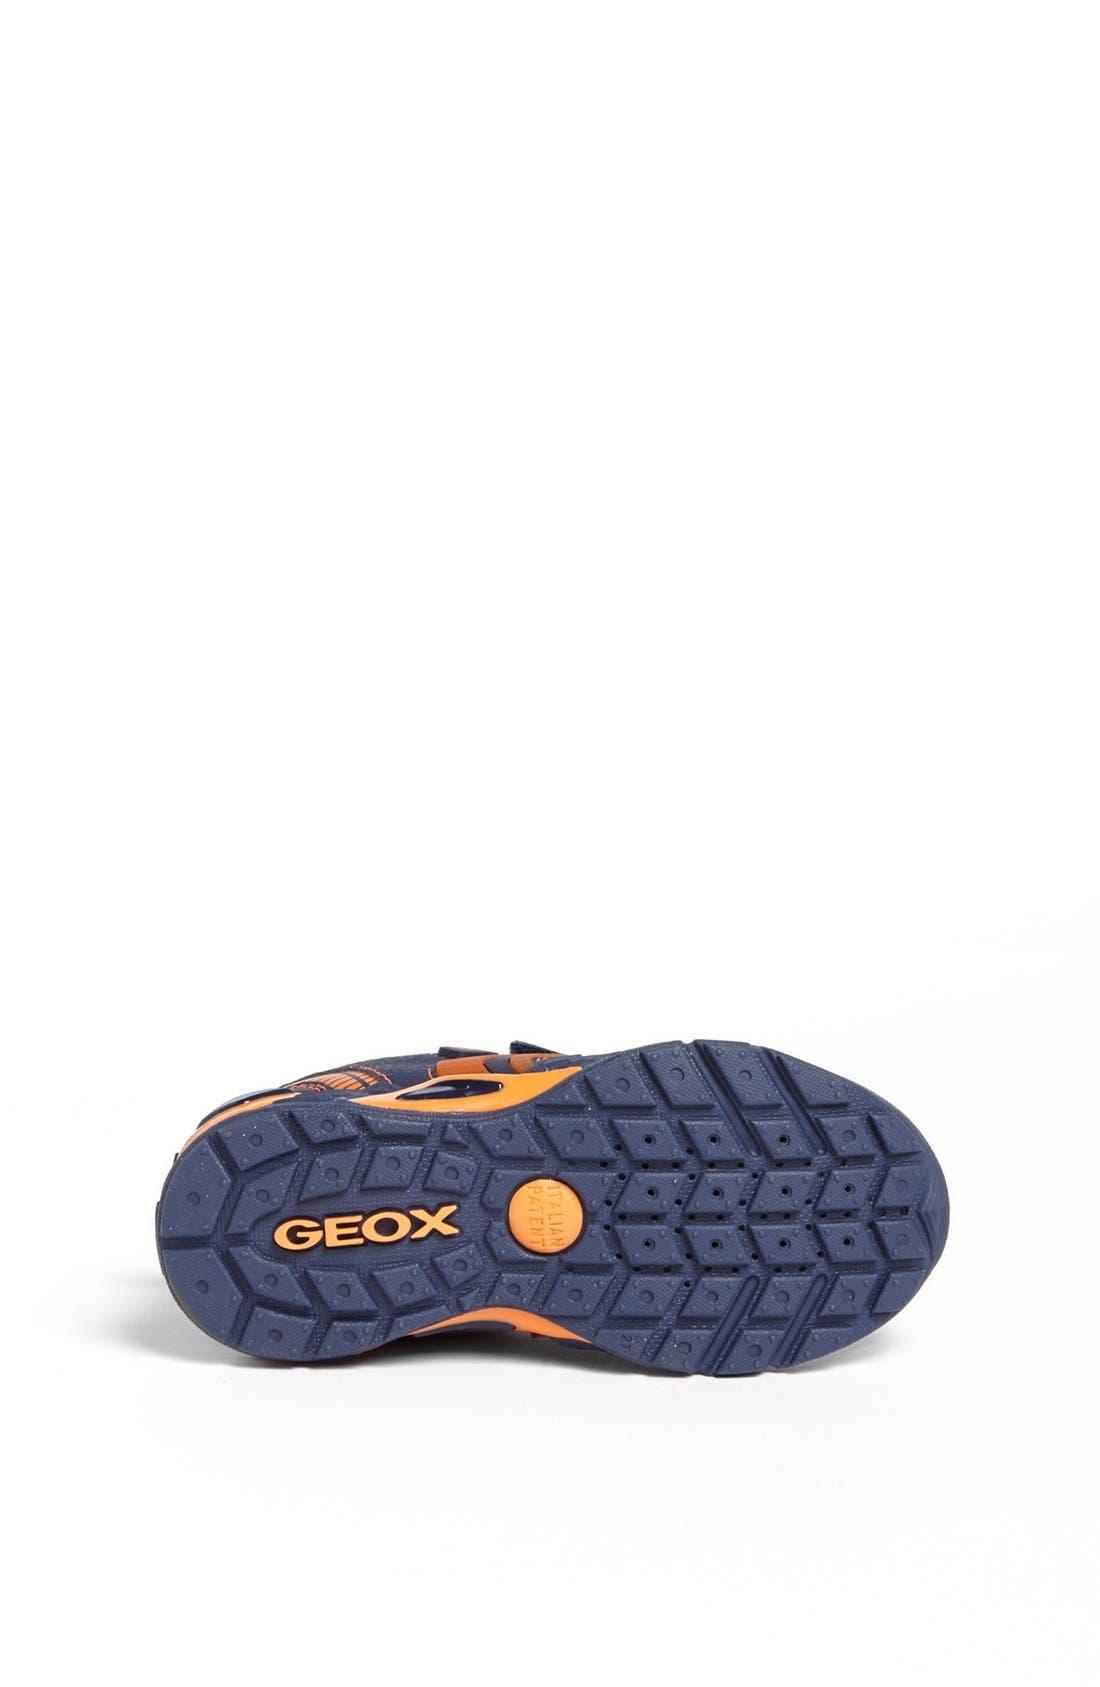 Alternate Image 4  - Geox 'Supreme' Light-Up Sneaker (Toddler, Little Kid & Big Kid)